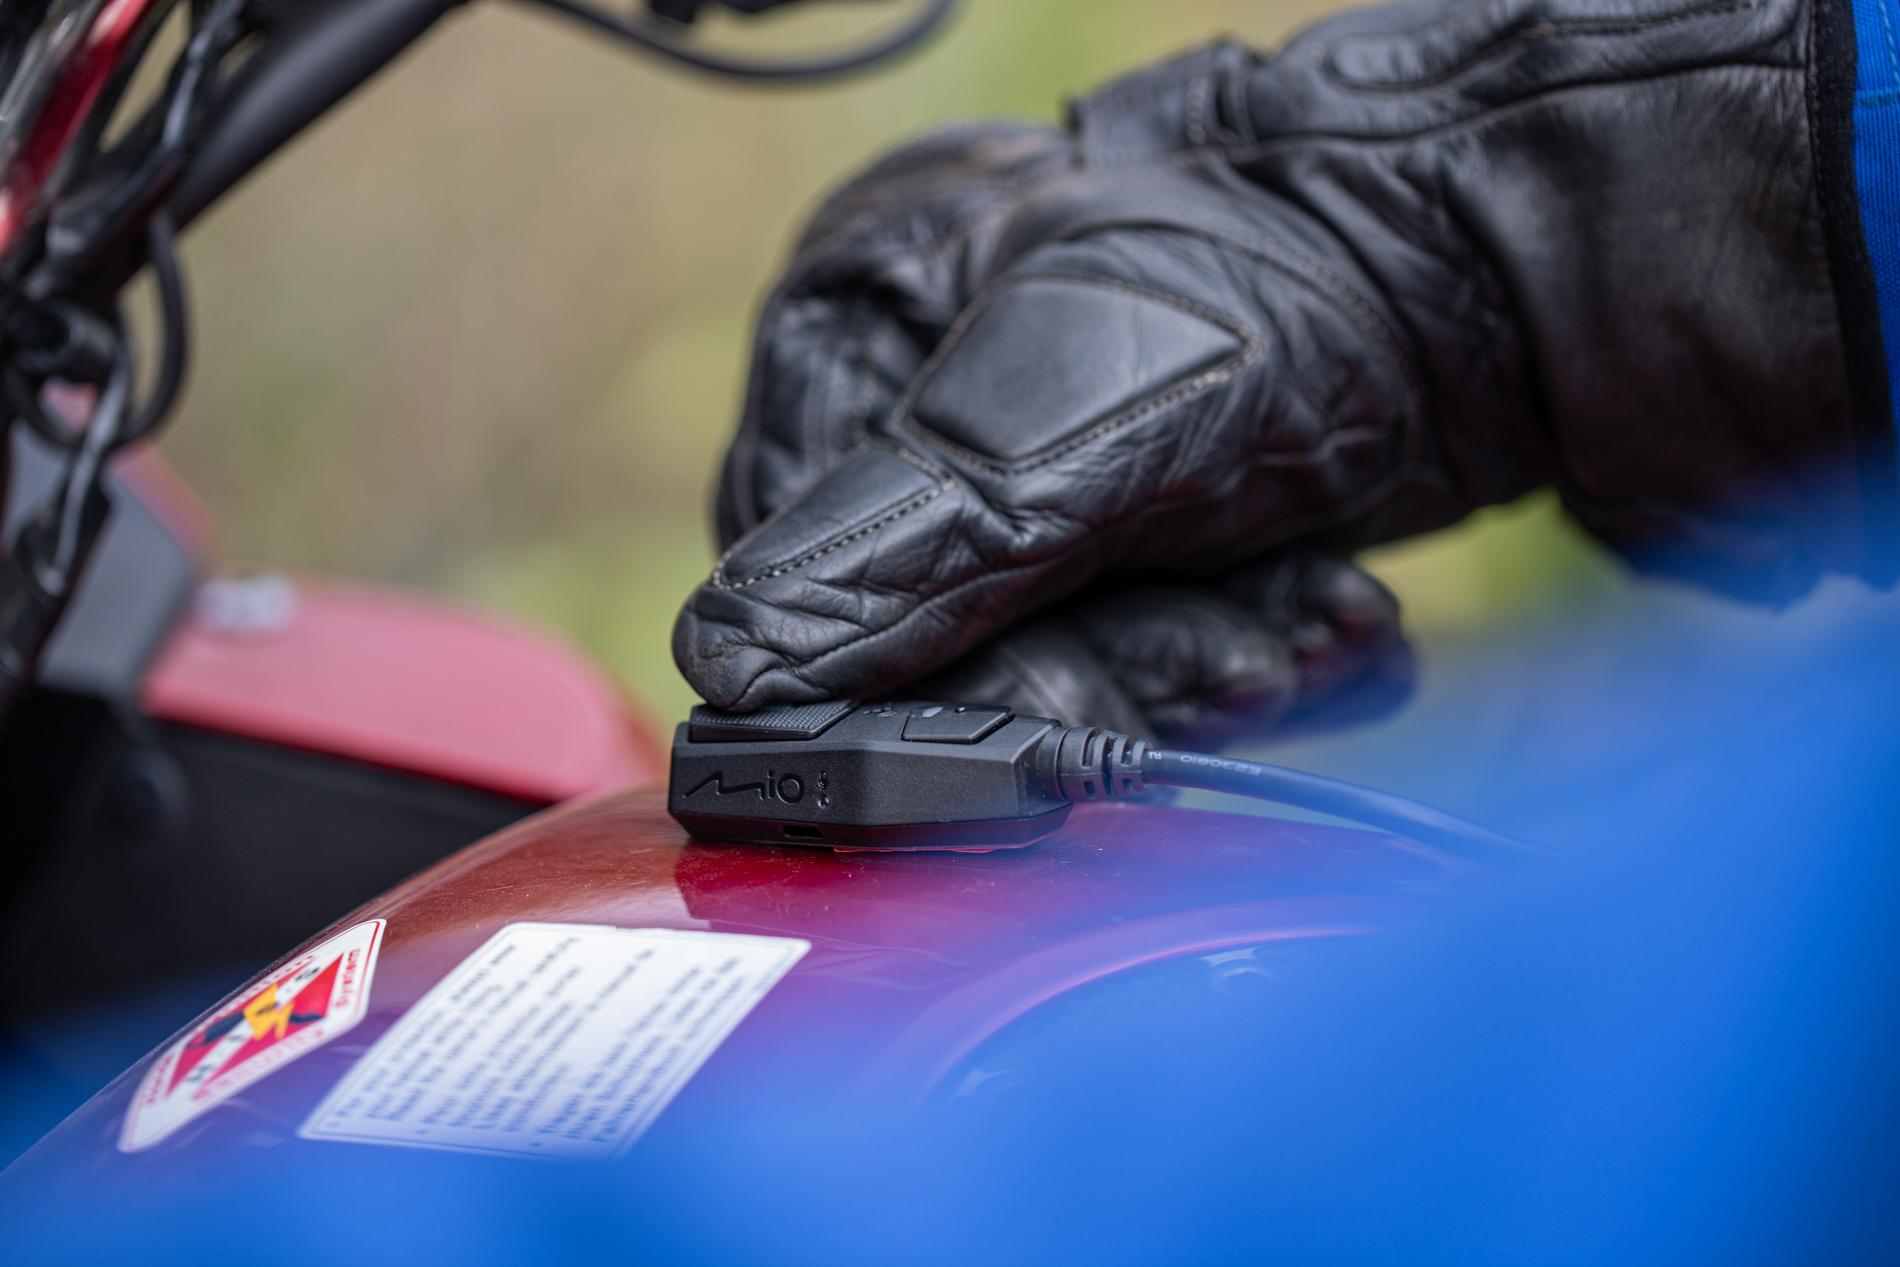 Test recenzja Mio MiVue M760D wideorejestrator motocykl